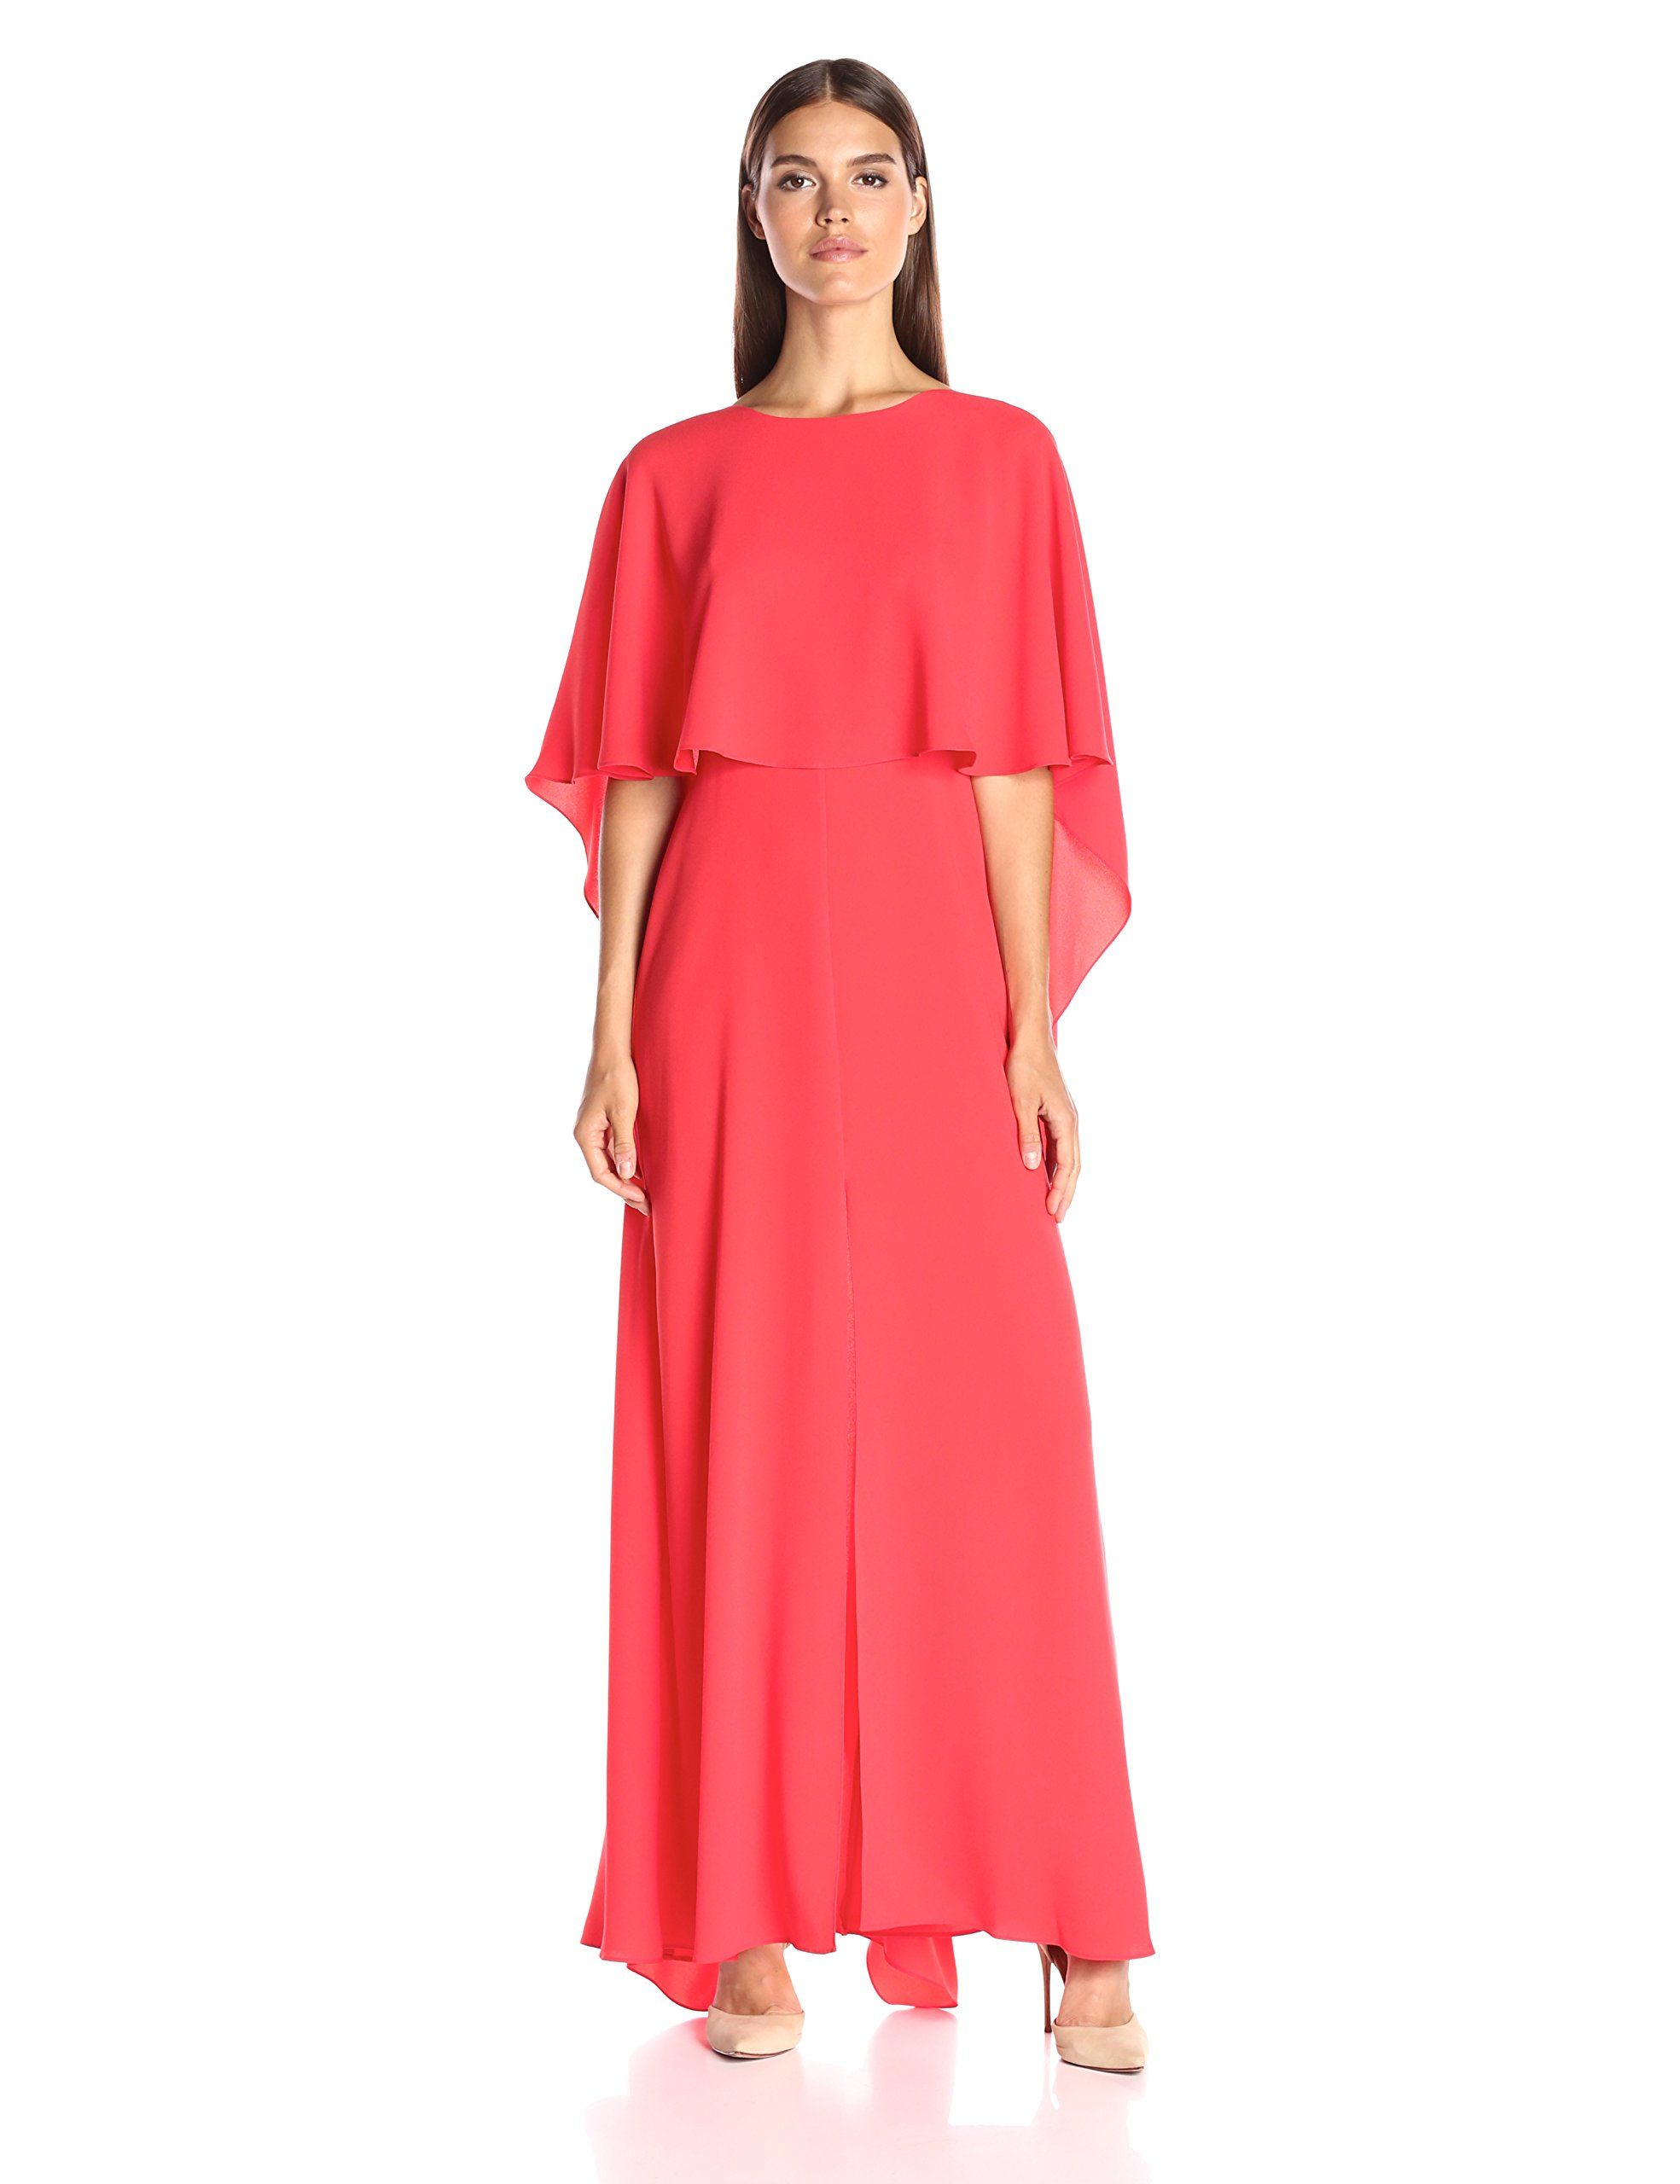 Bcbgmax azria womenus jamey long cape sleeve dress bright poppy